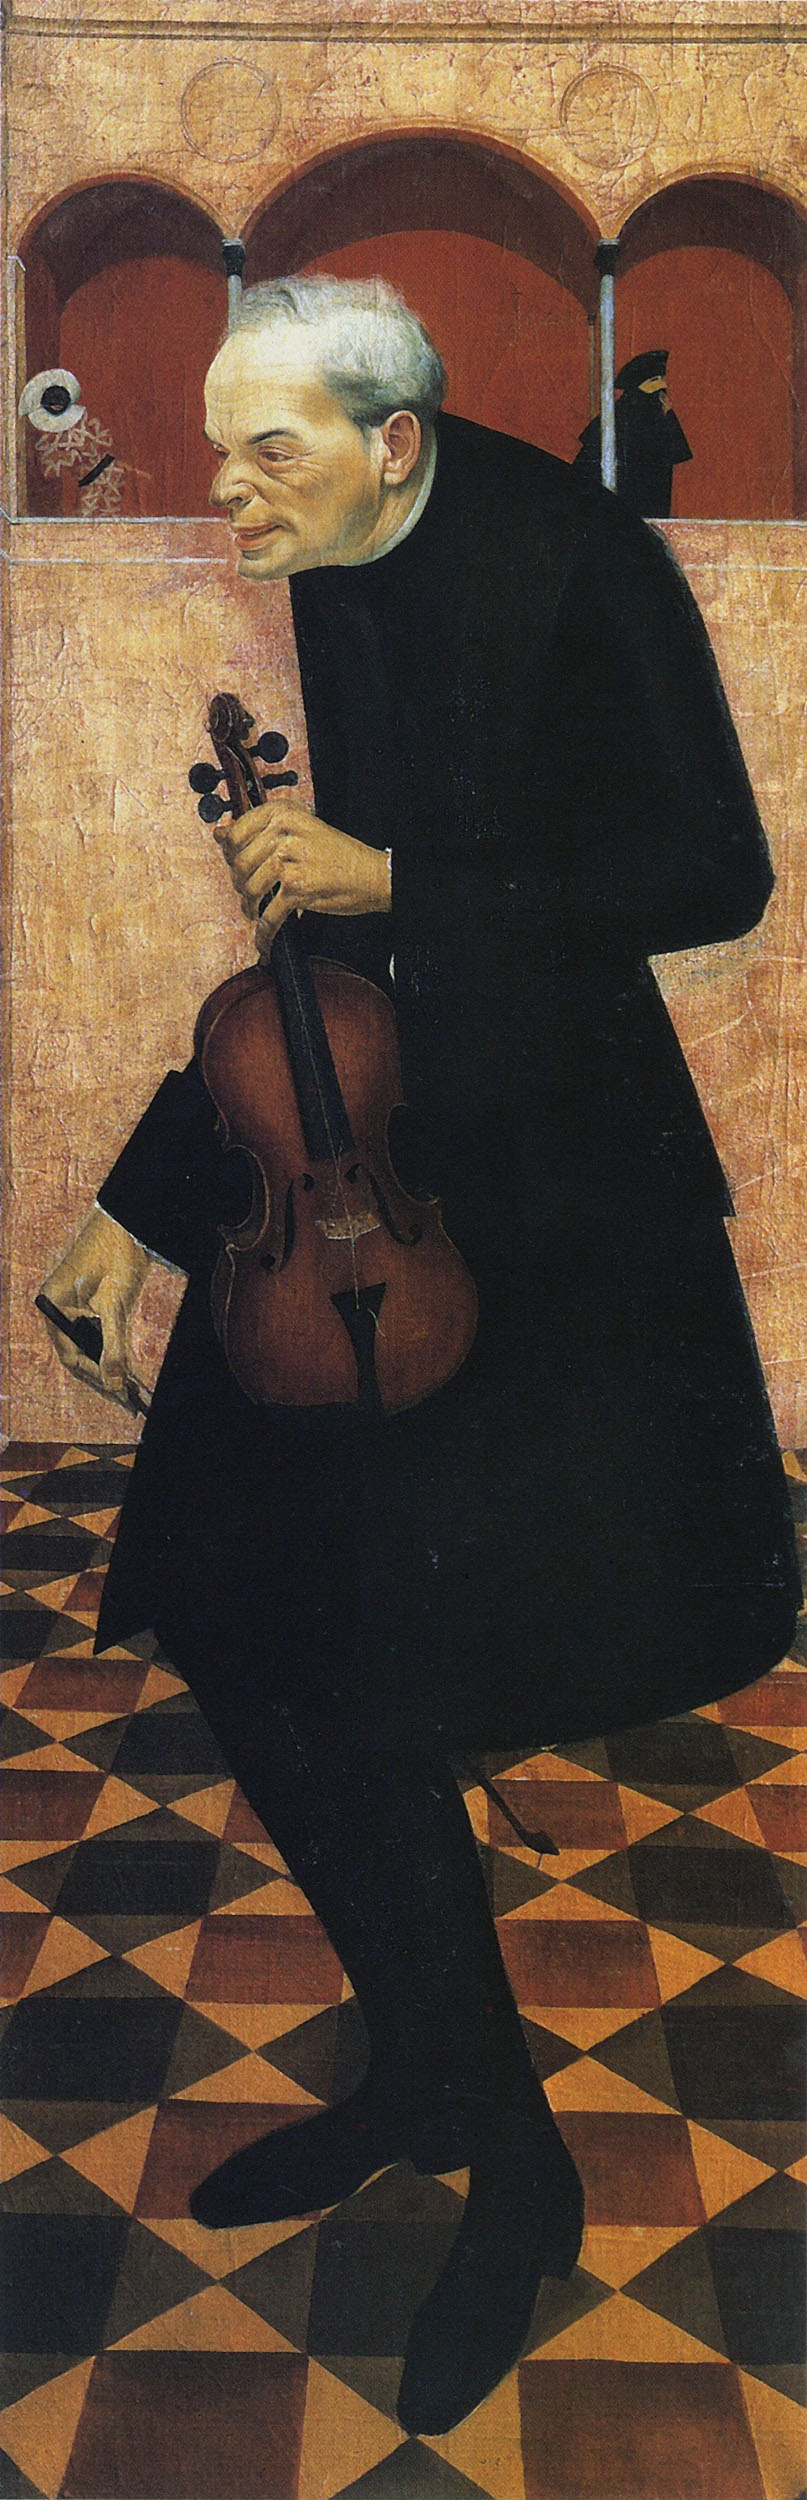 Alexander Yakovlev. Violinist. 1915